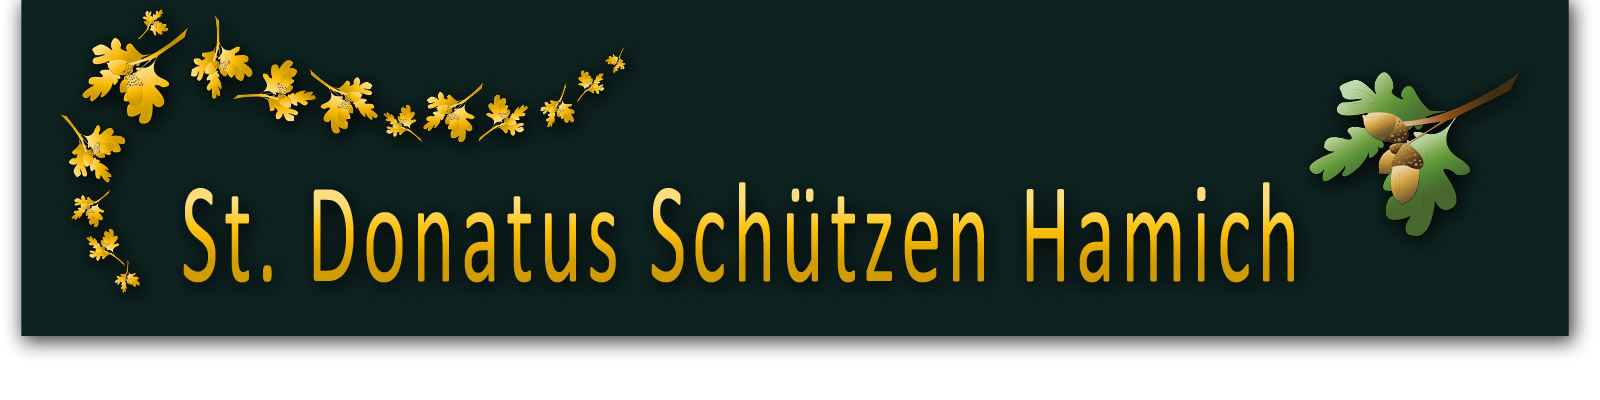 St. Donatus Schützen Hamich